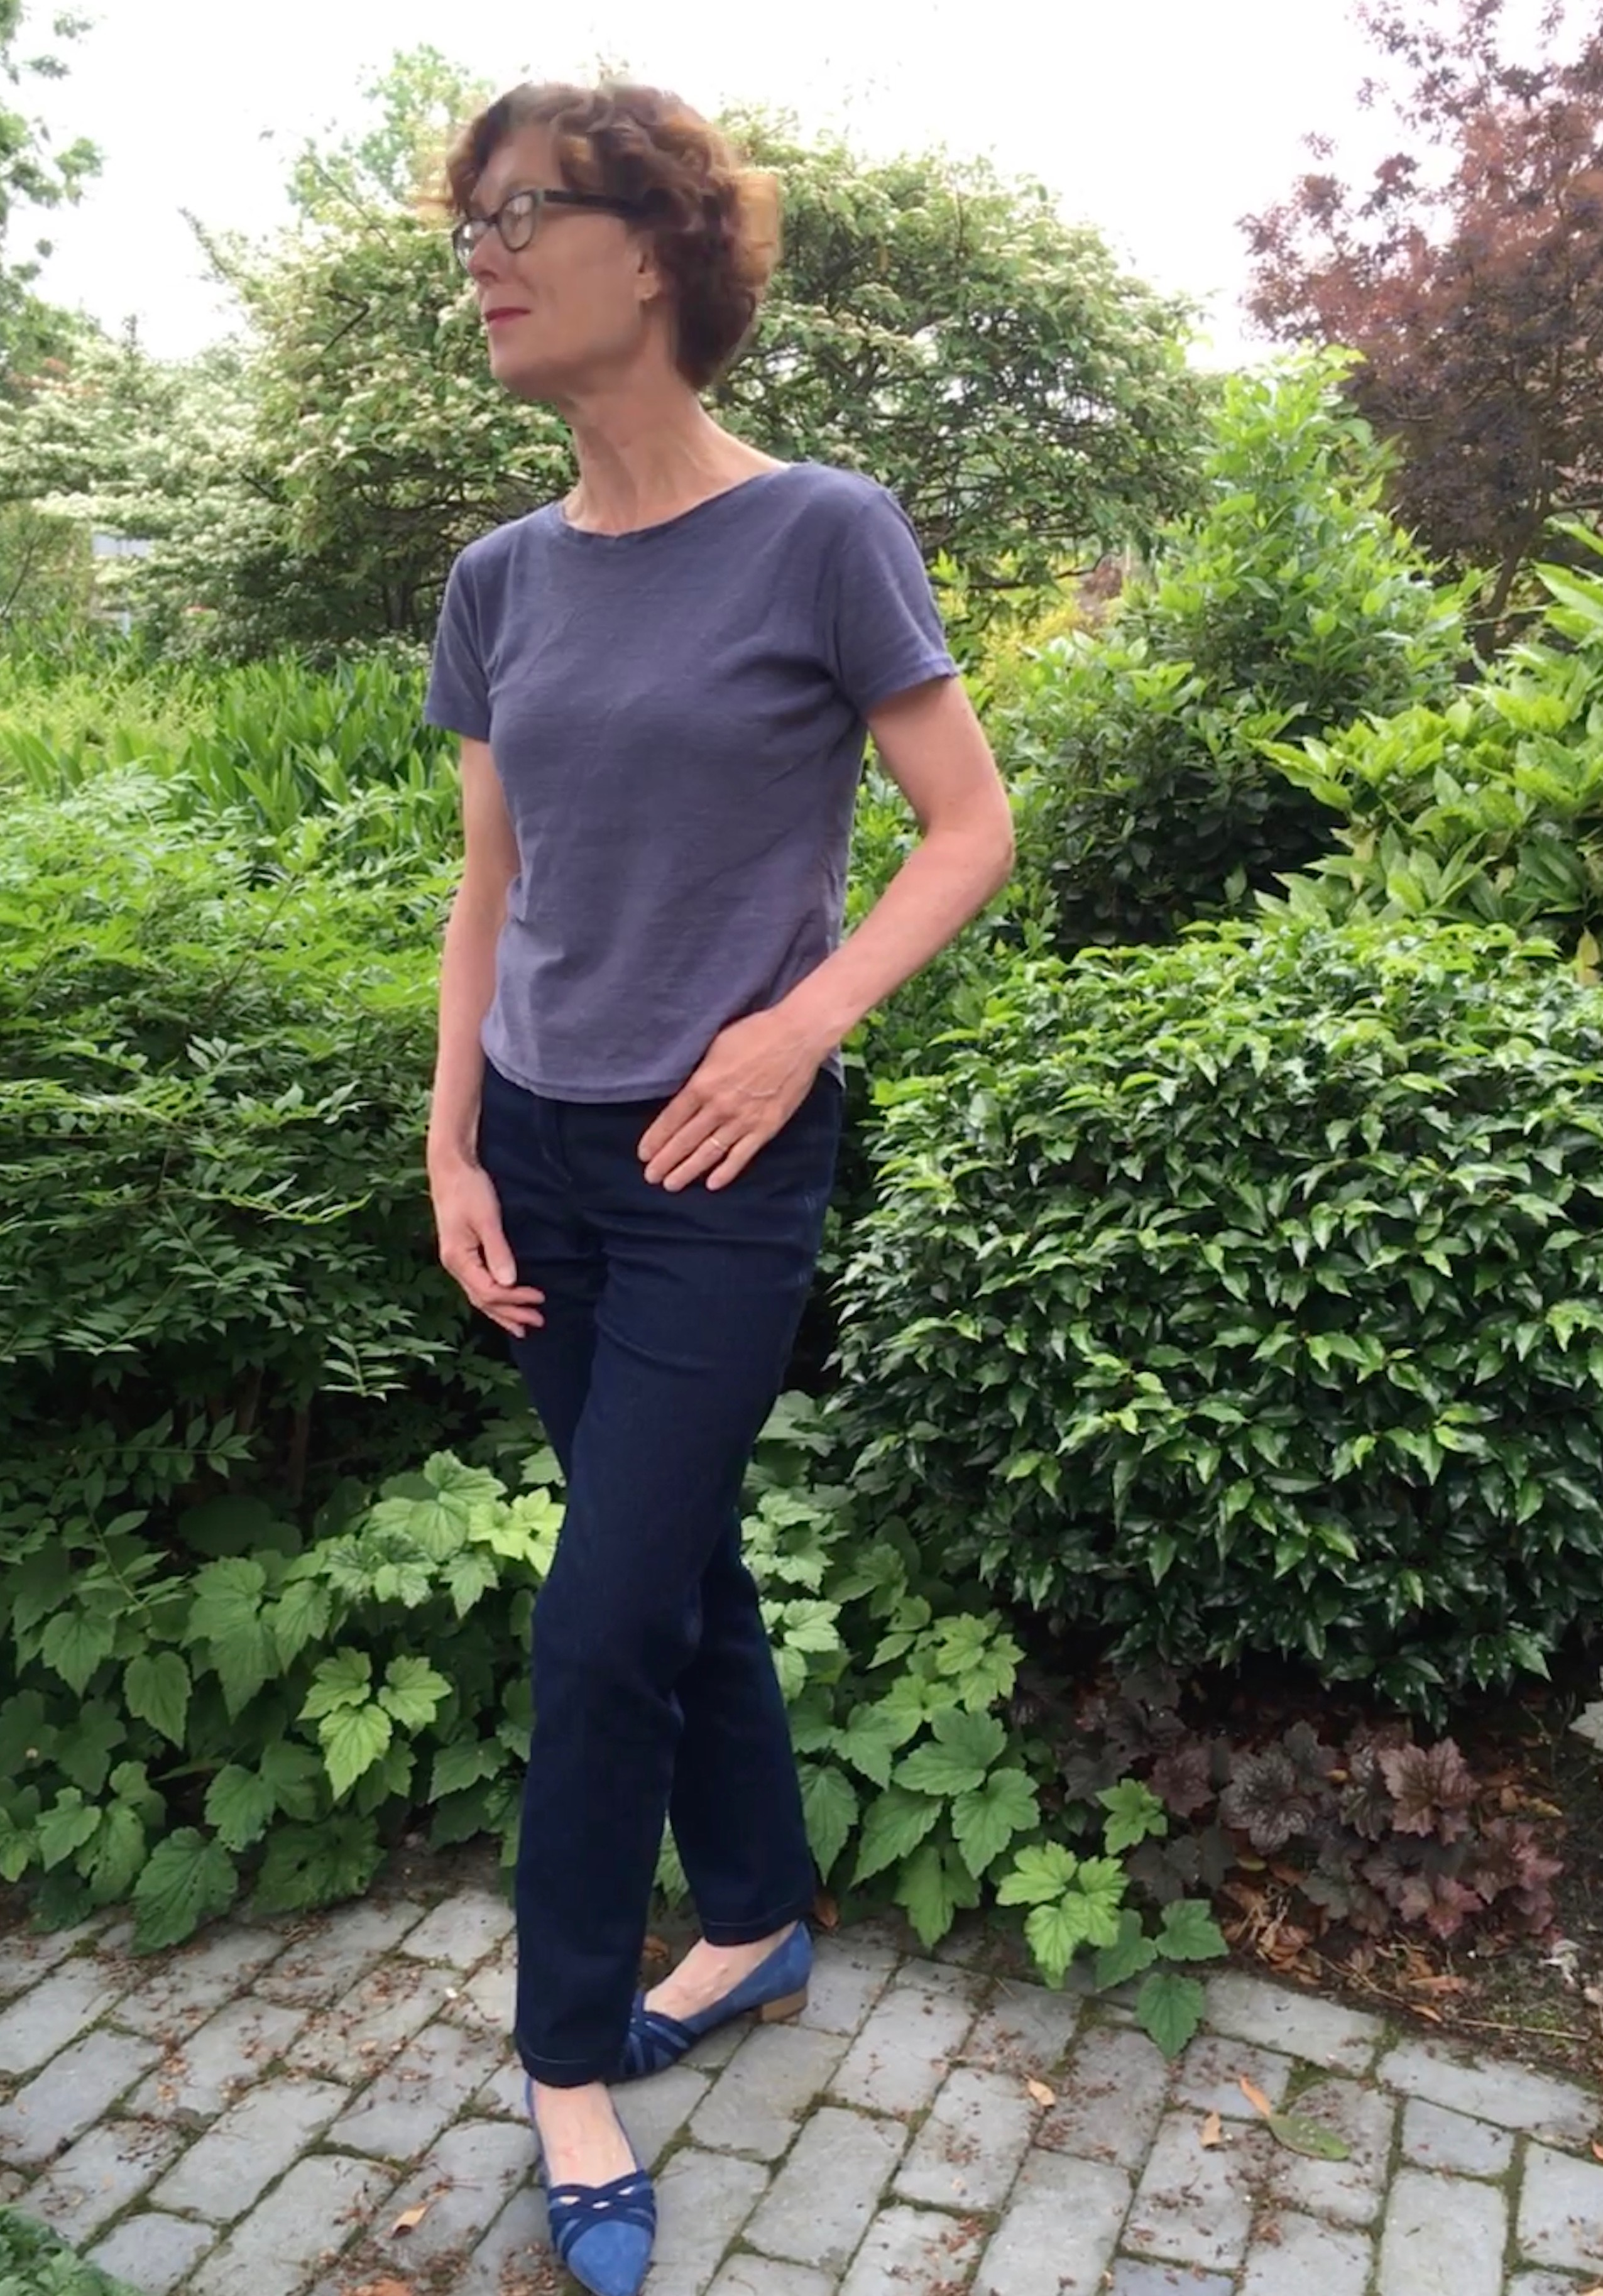 LMV Malmö Broek jeans-style